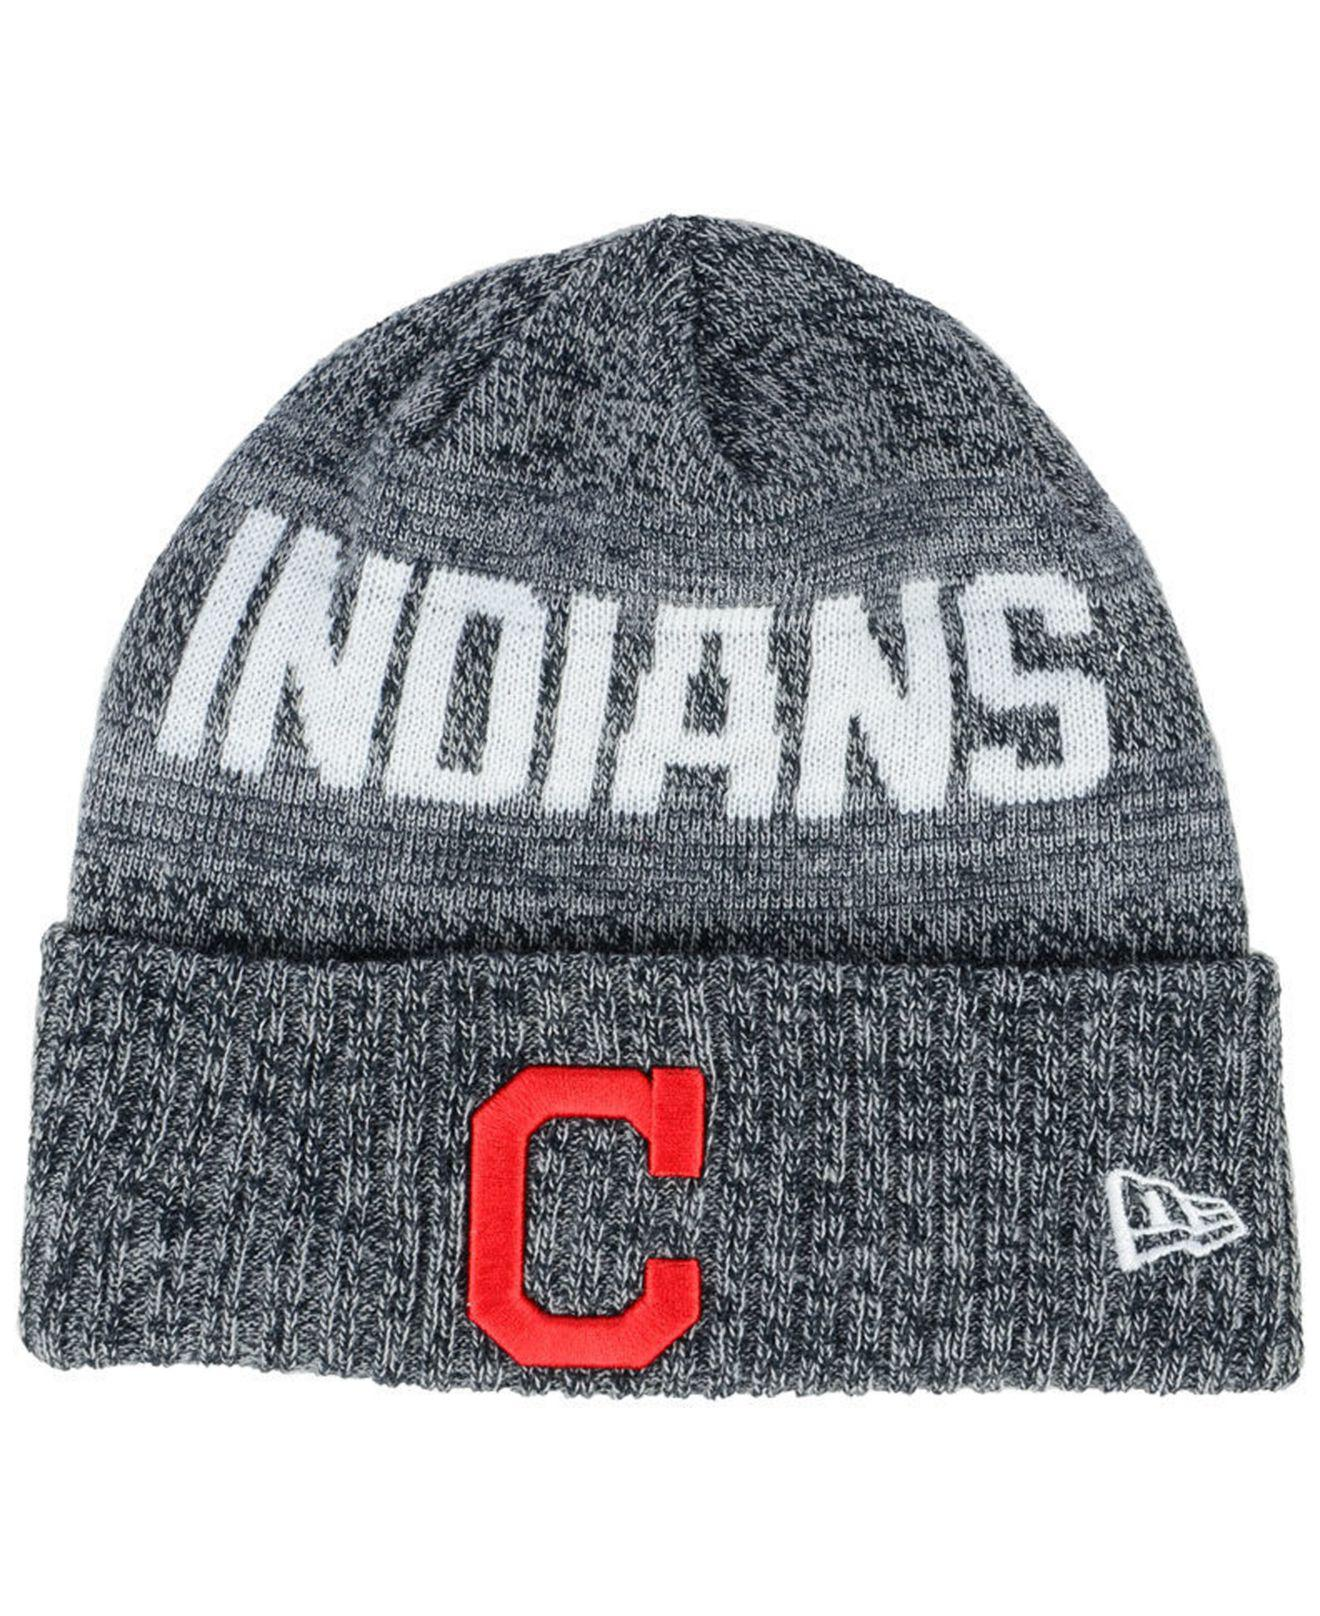 Lyst - Ktz Cleveland Indians Crisp Color Cuff Knit Hat in Blue for Men 49e5da3b7